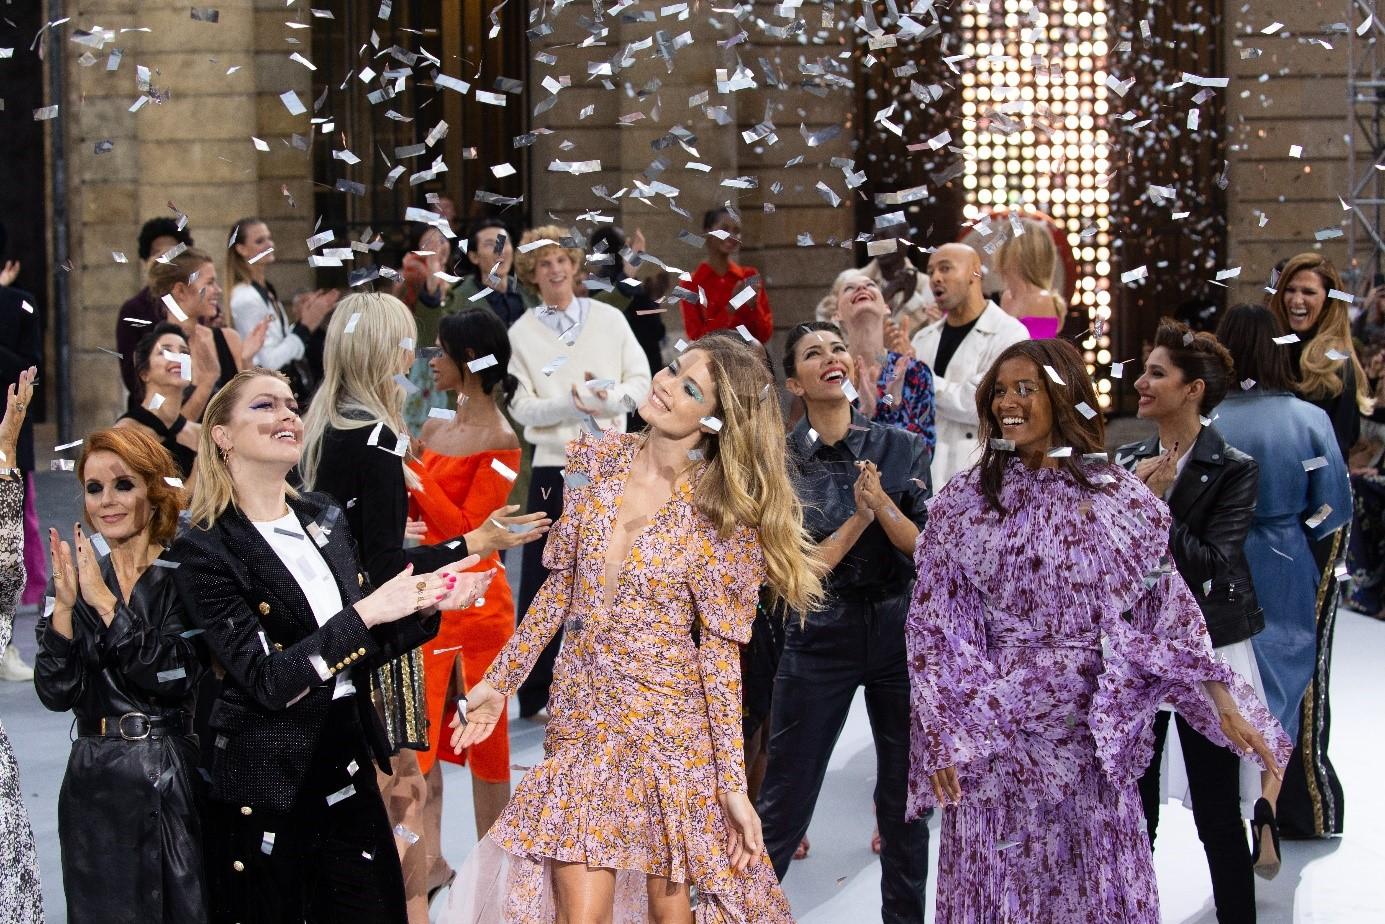 Lễ hội làm đẹp của L'Oréal Paris tại Tuần lễ thời trang Paris